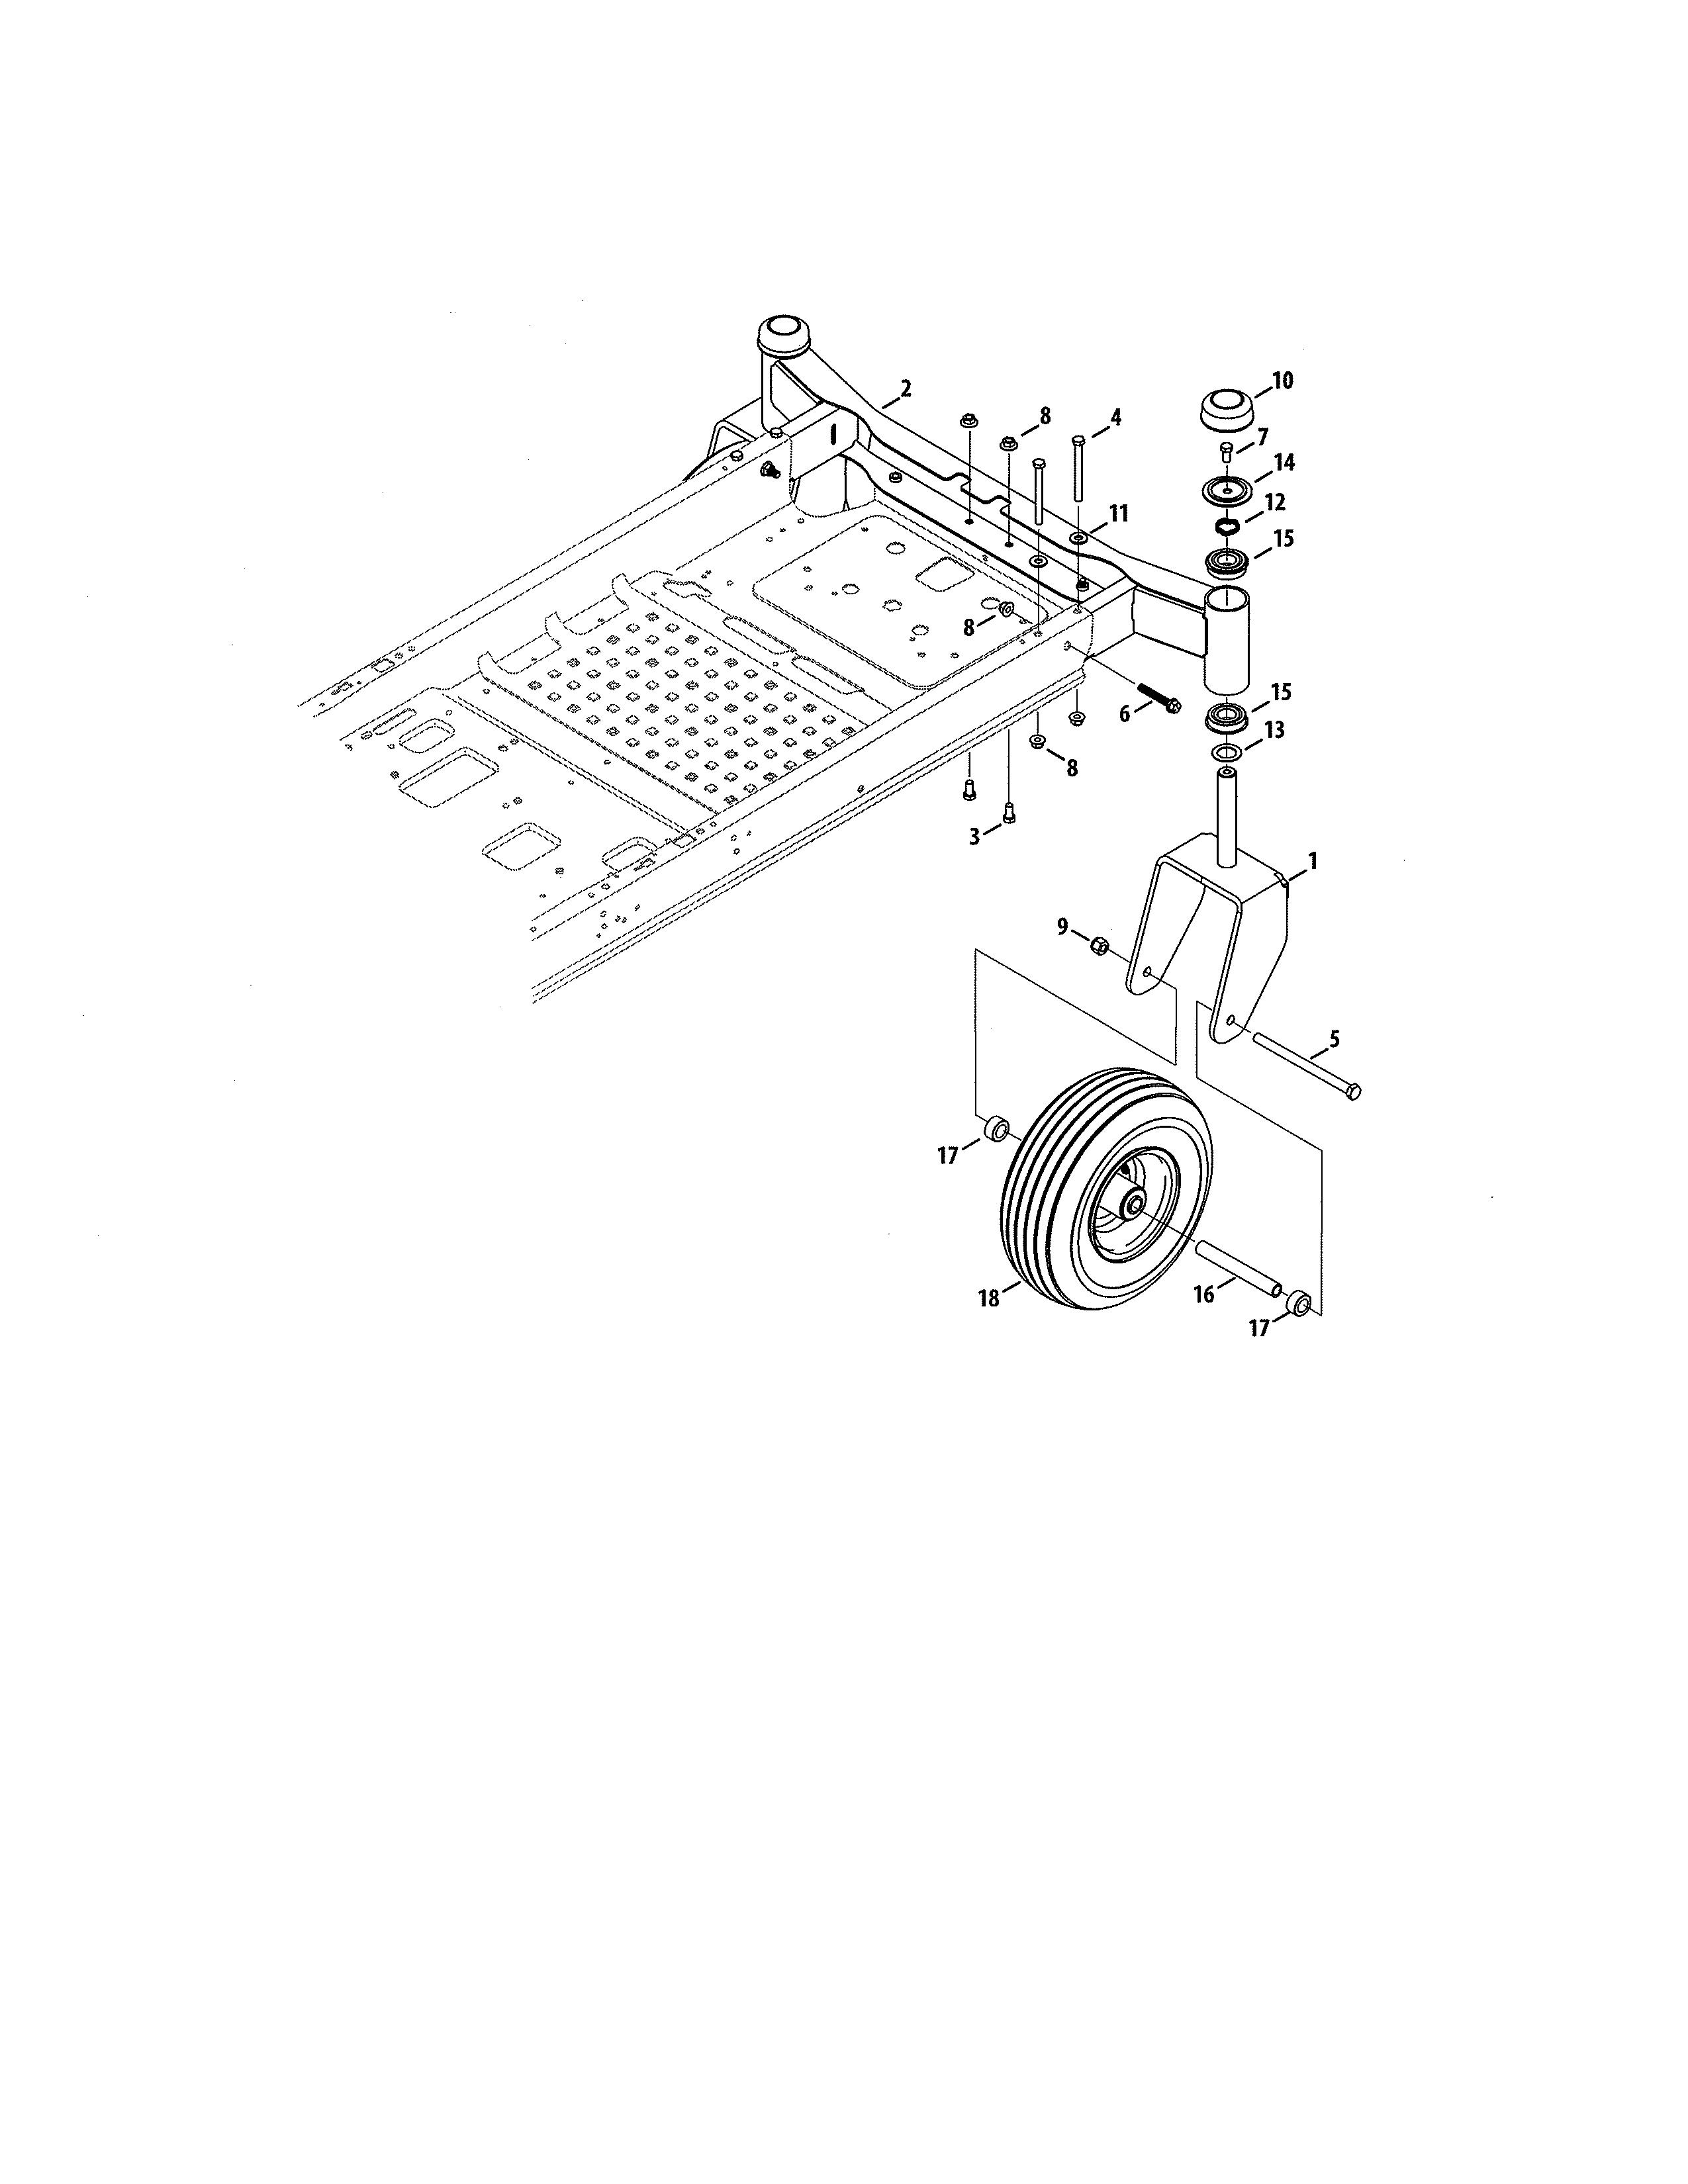 Craftsman  Zero Turn Riding Mower  Wheel assembly